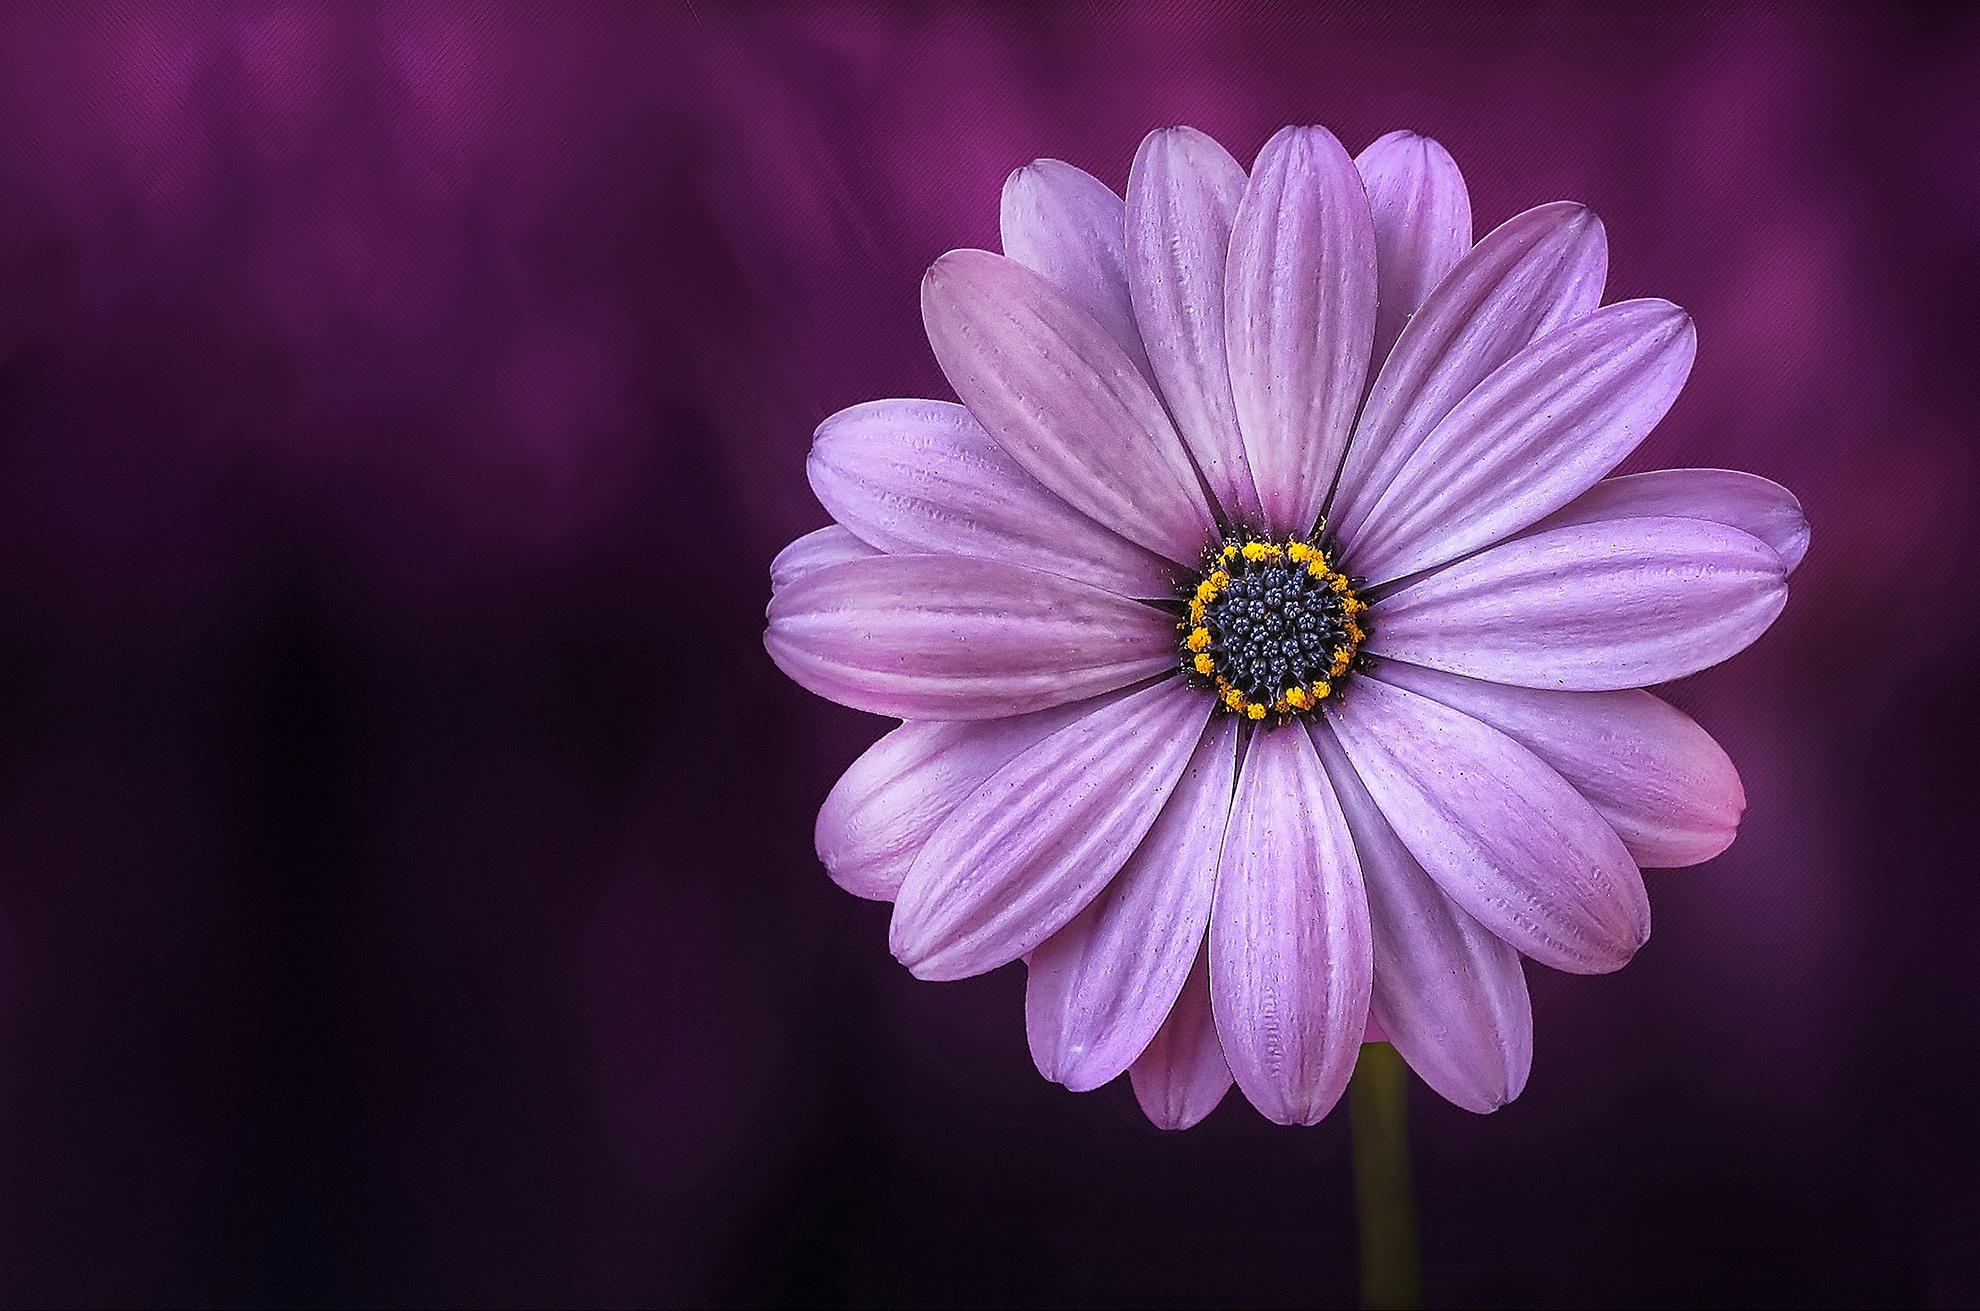 free images nature blossom flower purple petal bloom floral